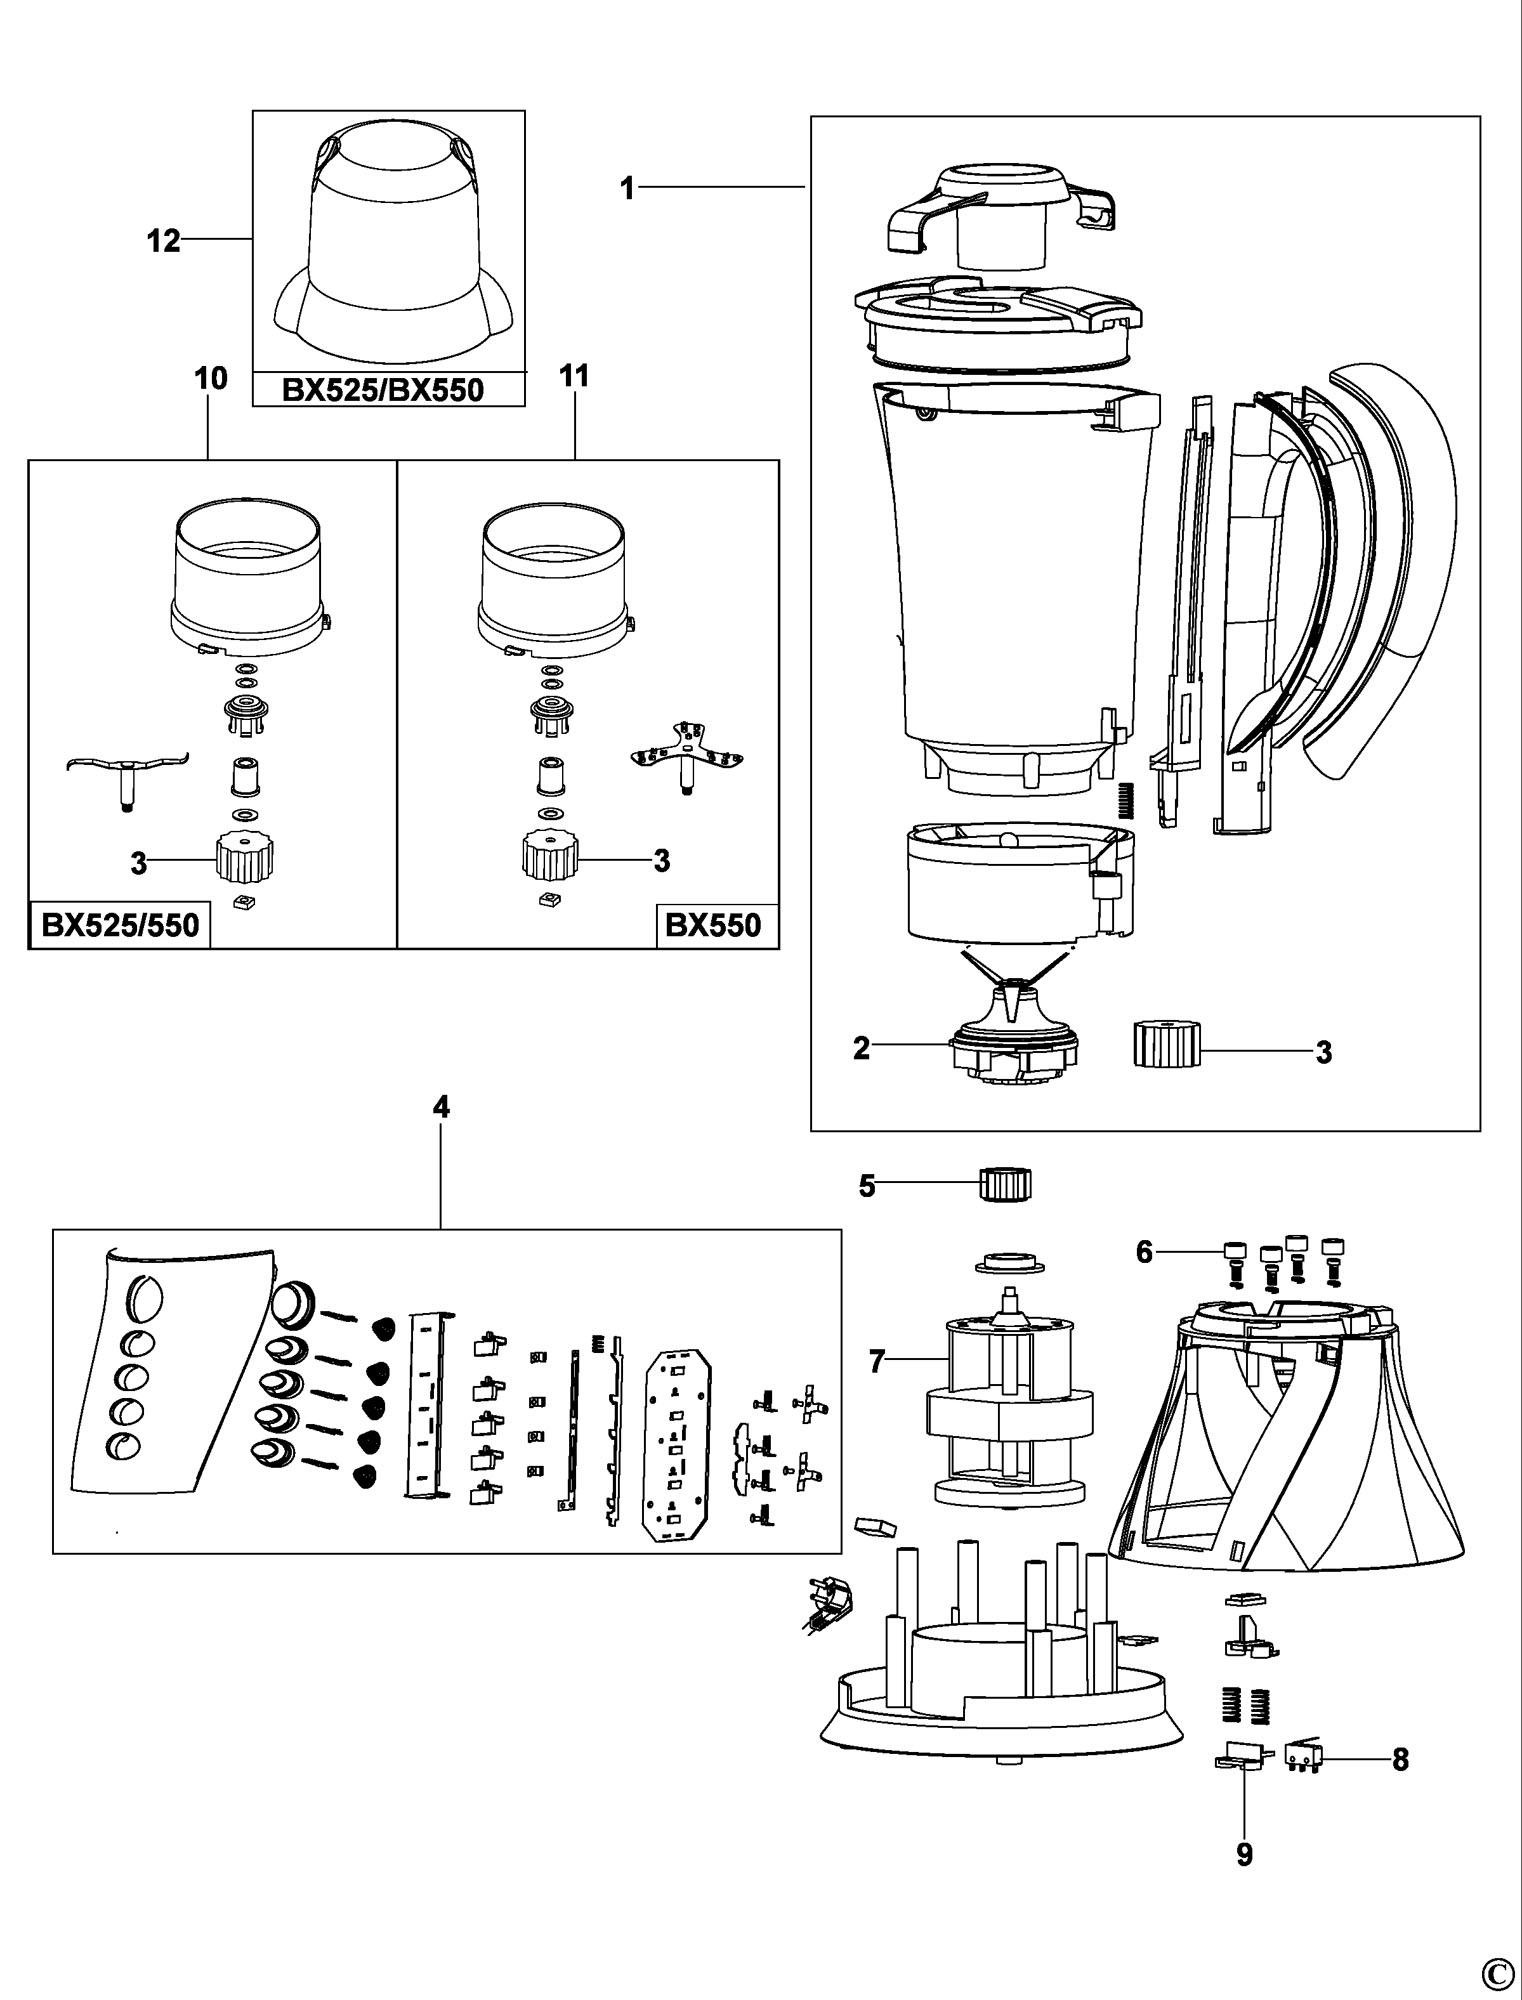 Spares for Black & Decker Bx500 Blender (type 1) SPARE_BX500